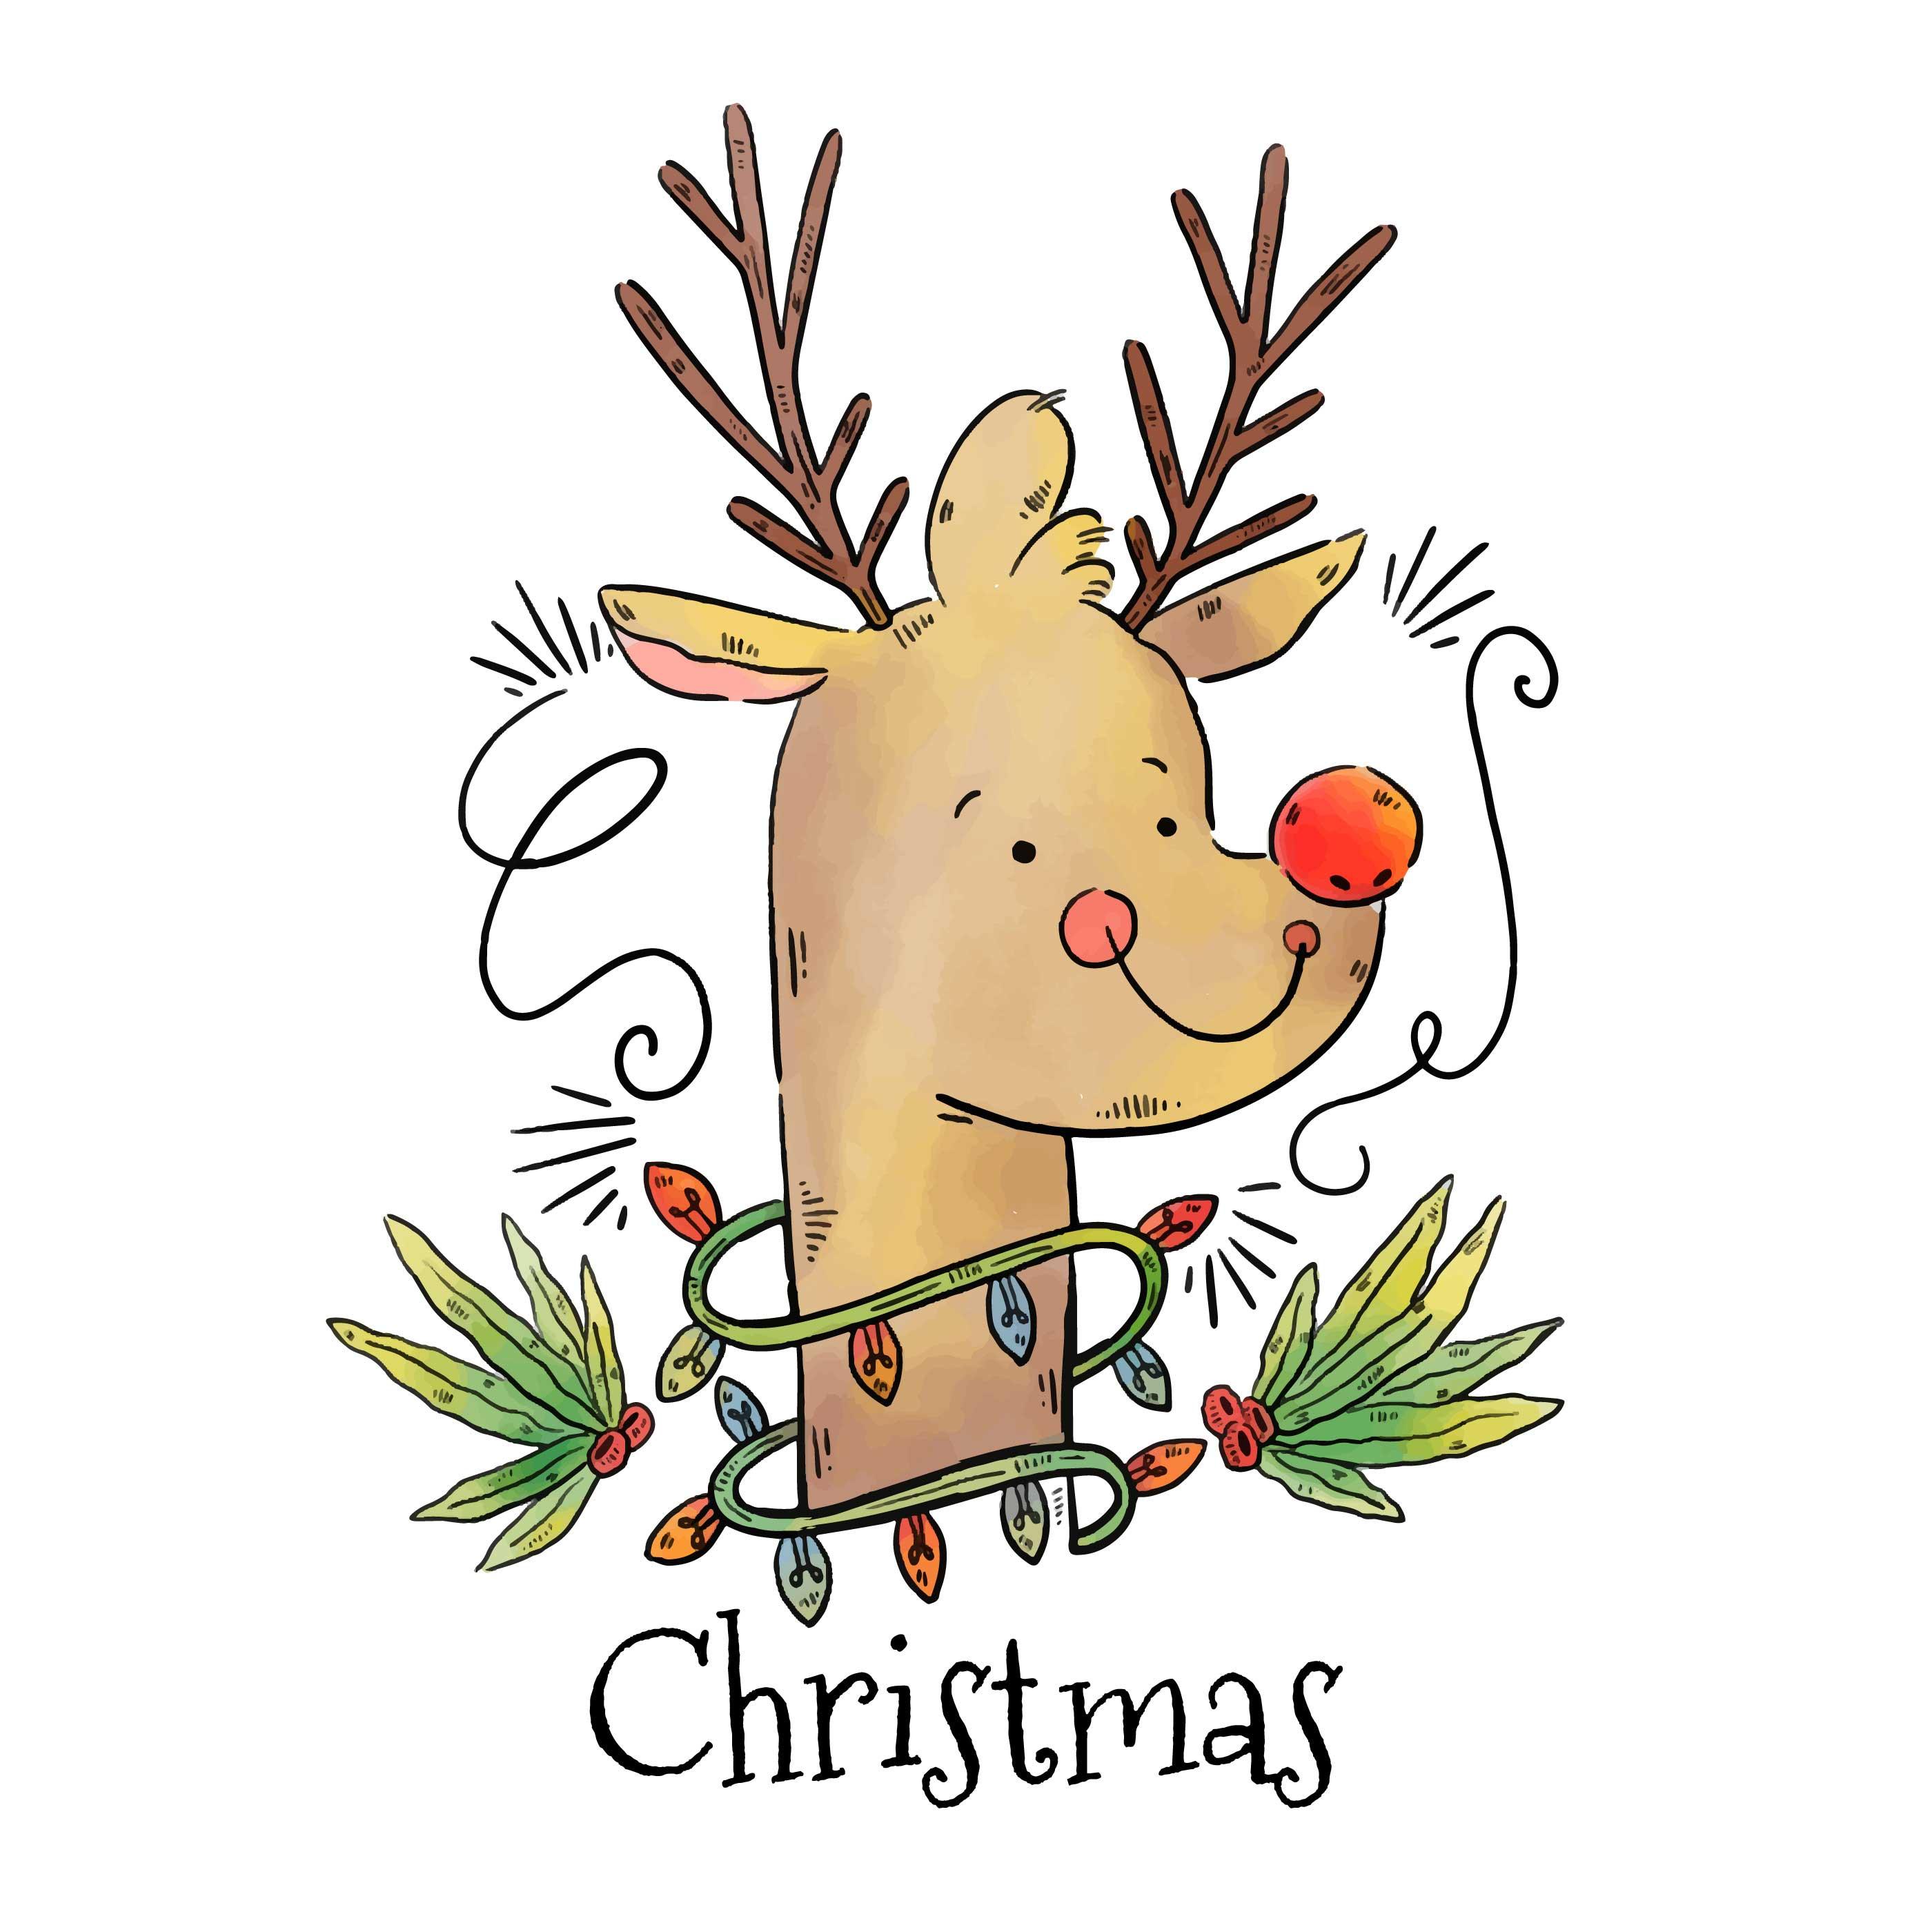 Rudolph Free Vector Art 5453 Free Downloads